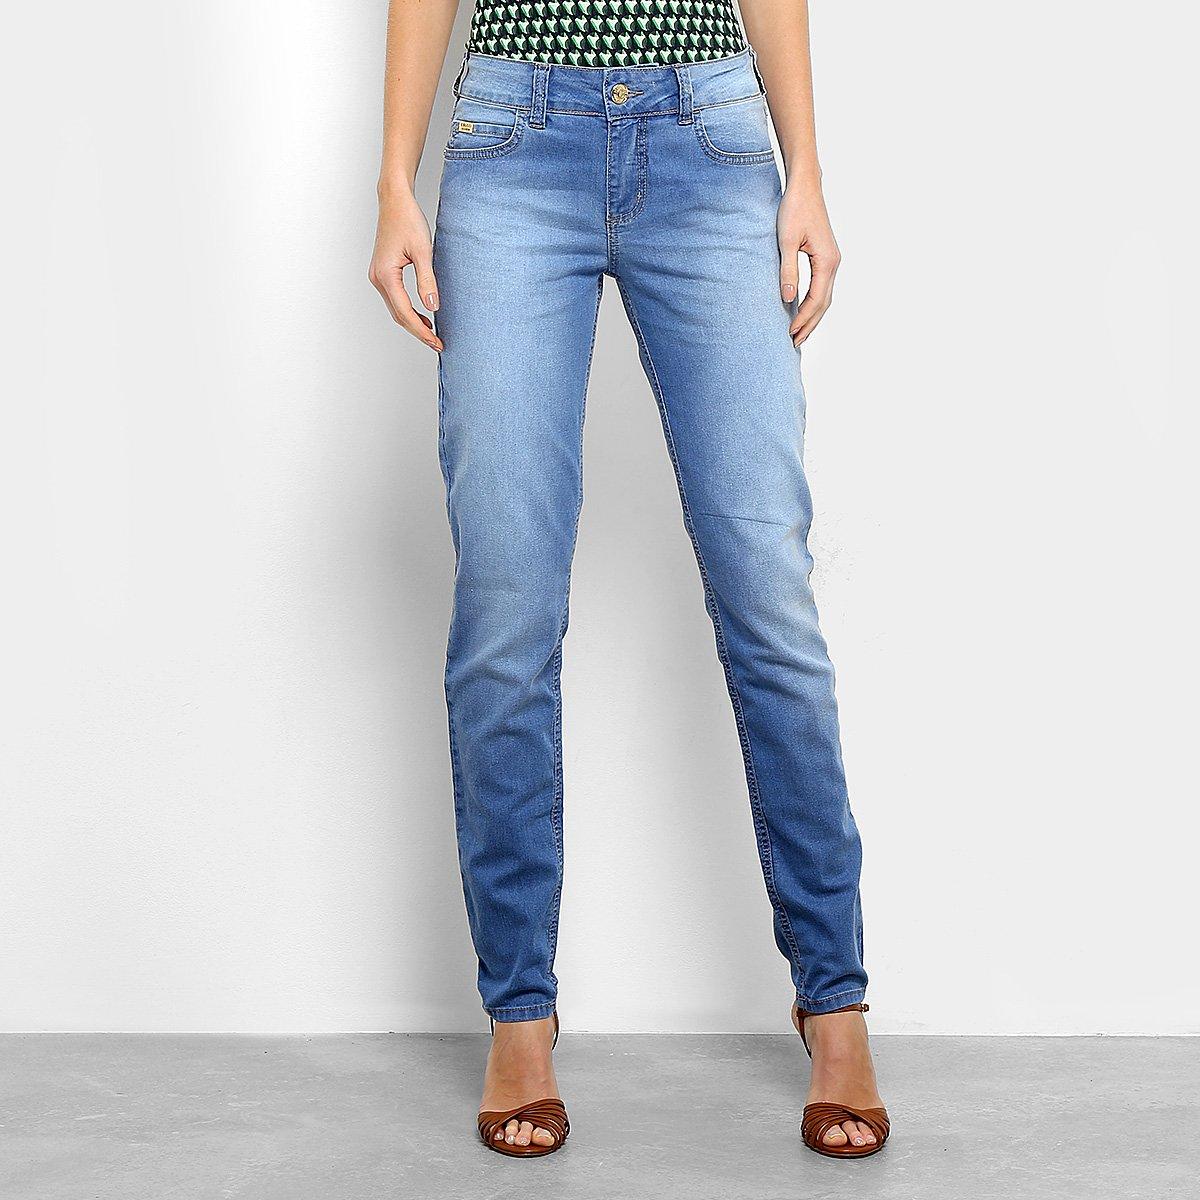 a457ea704 FornecedorZattini. Calça Jeans Skinny Colcci Estonada Cintura Média Feminina